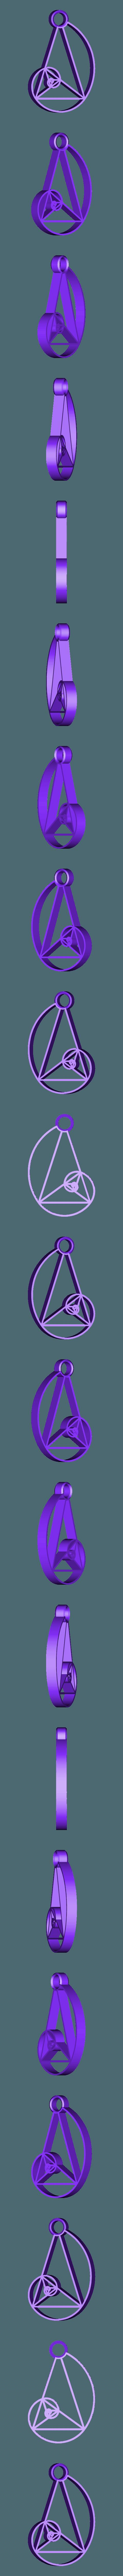 LogaSpiral40mm.stl Download free STL file Logarithmic Spiral, Golden Triangle, Golden Gnomon, Spira Mirabilis • 3D print object, LGBU